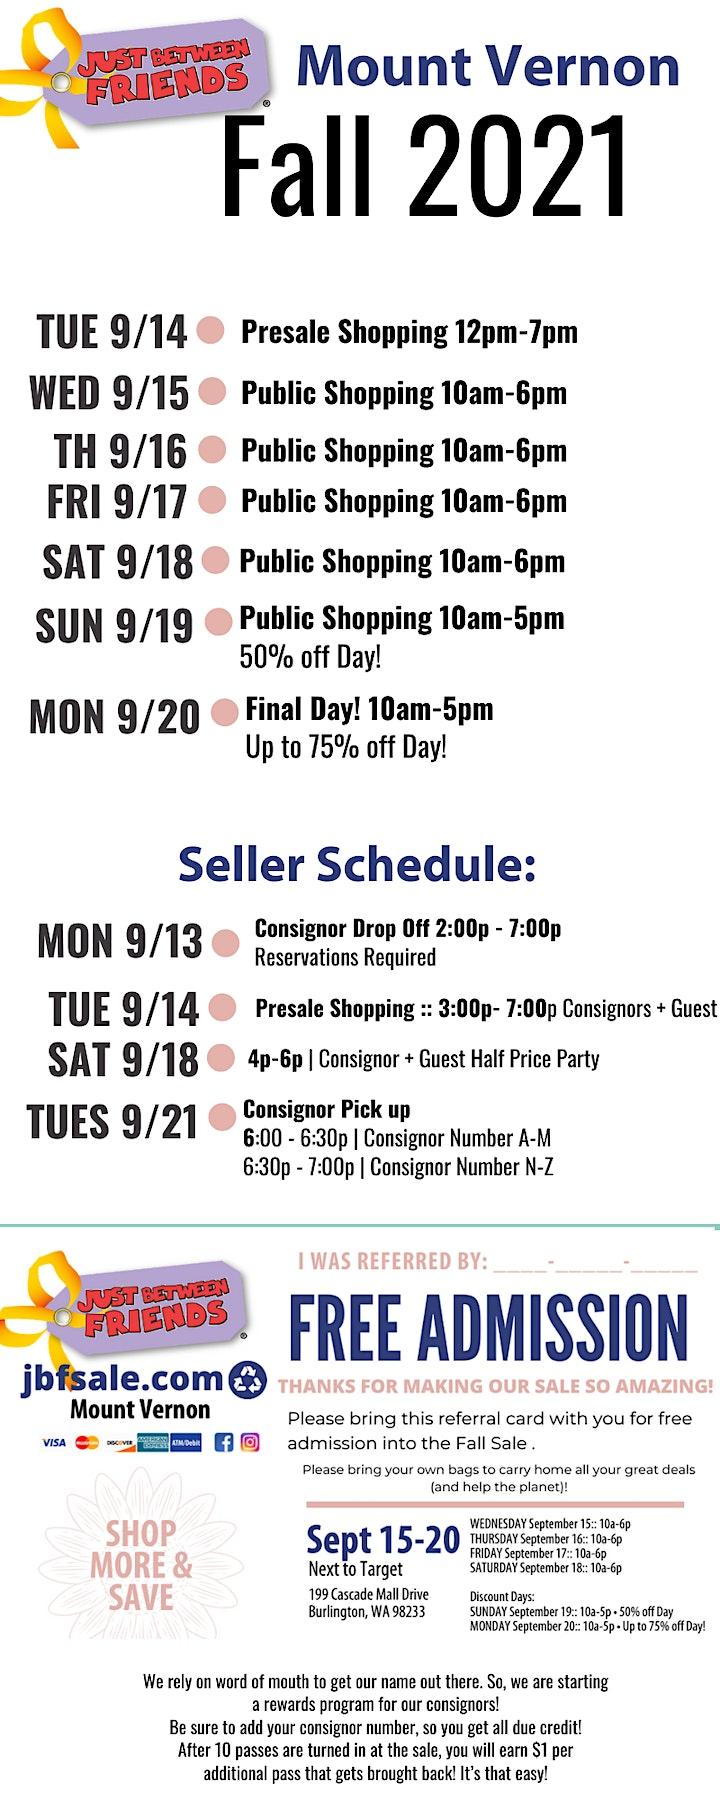 Huge Kids Consignment Pop-Up Shop! JBF Mount Vernon Fall 2021 image